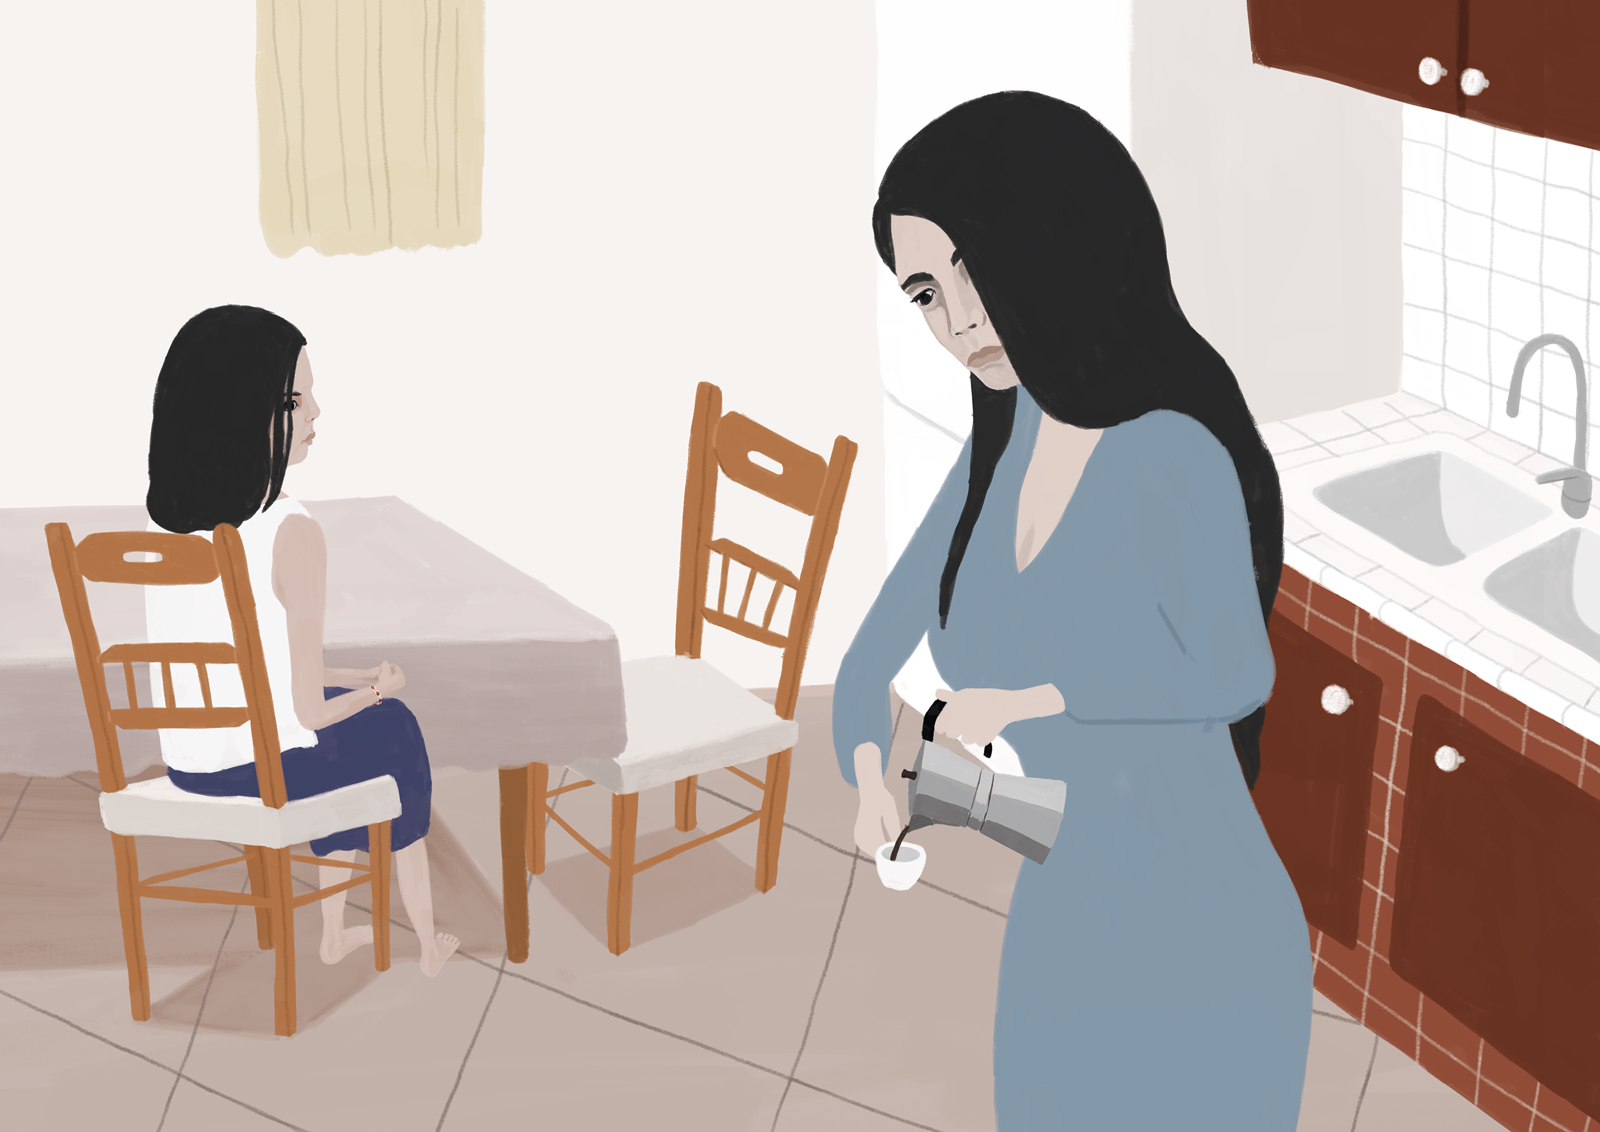 de_vuxnas-illustration-mia_olofsson-kitchen-w1600